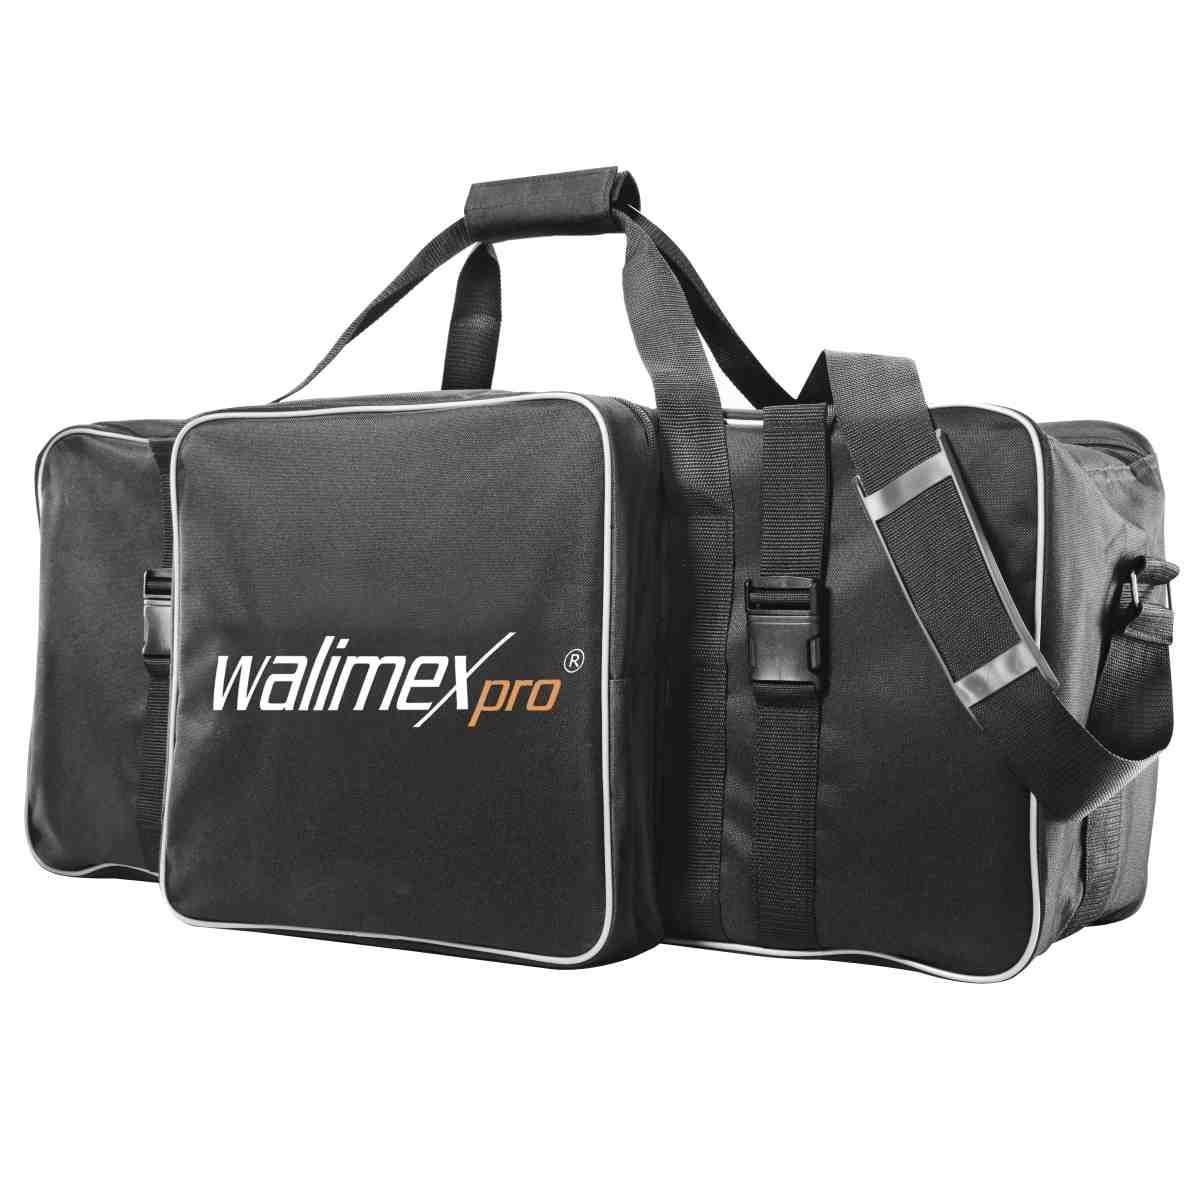 Walimex pro Studio Bag XL 75cm